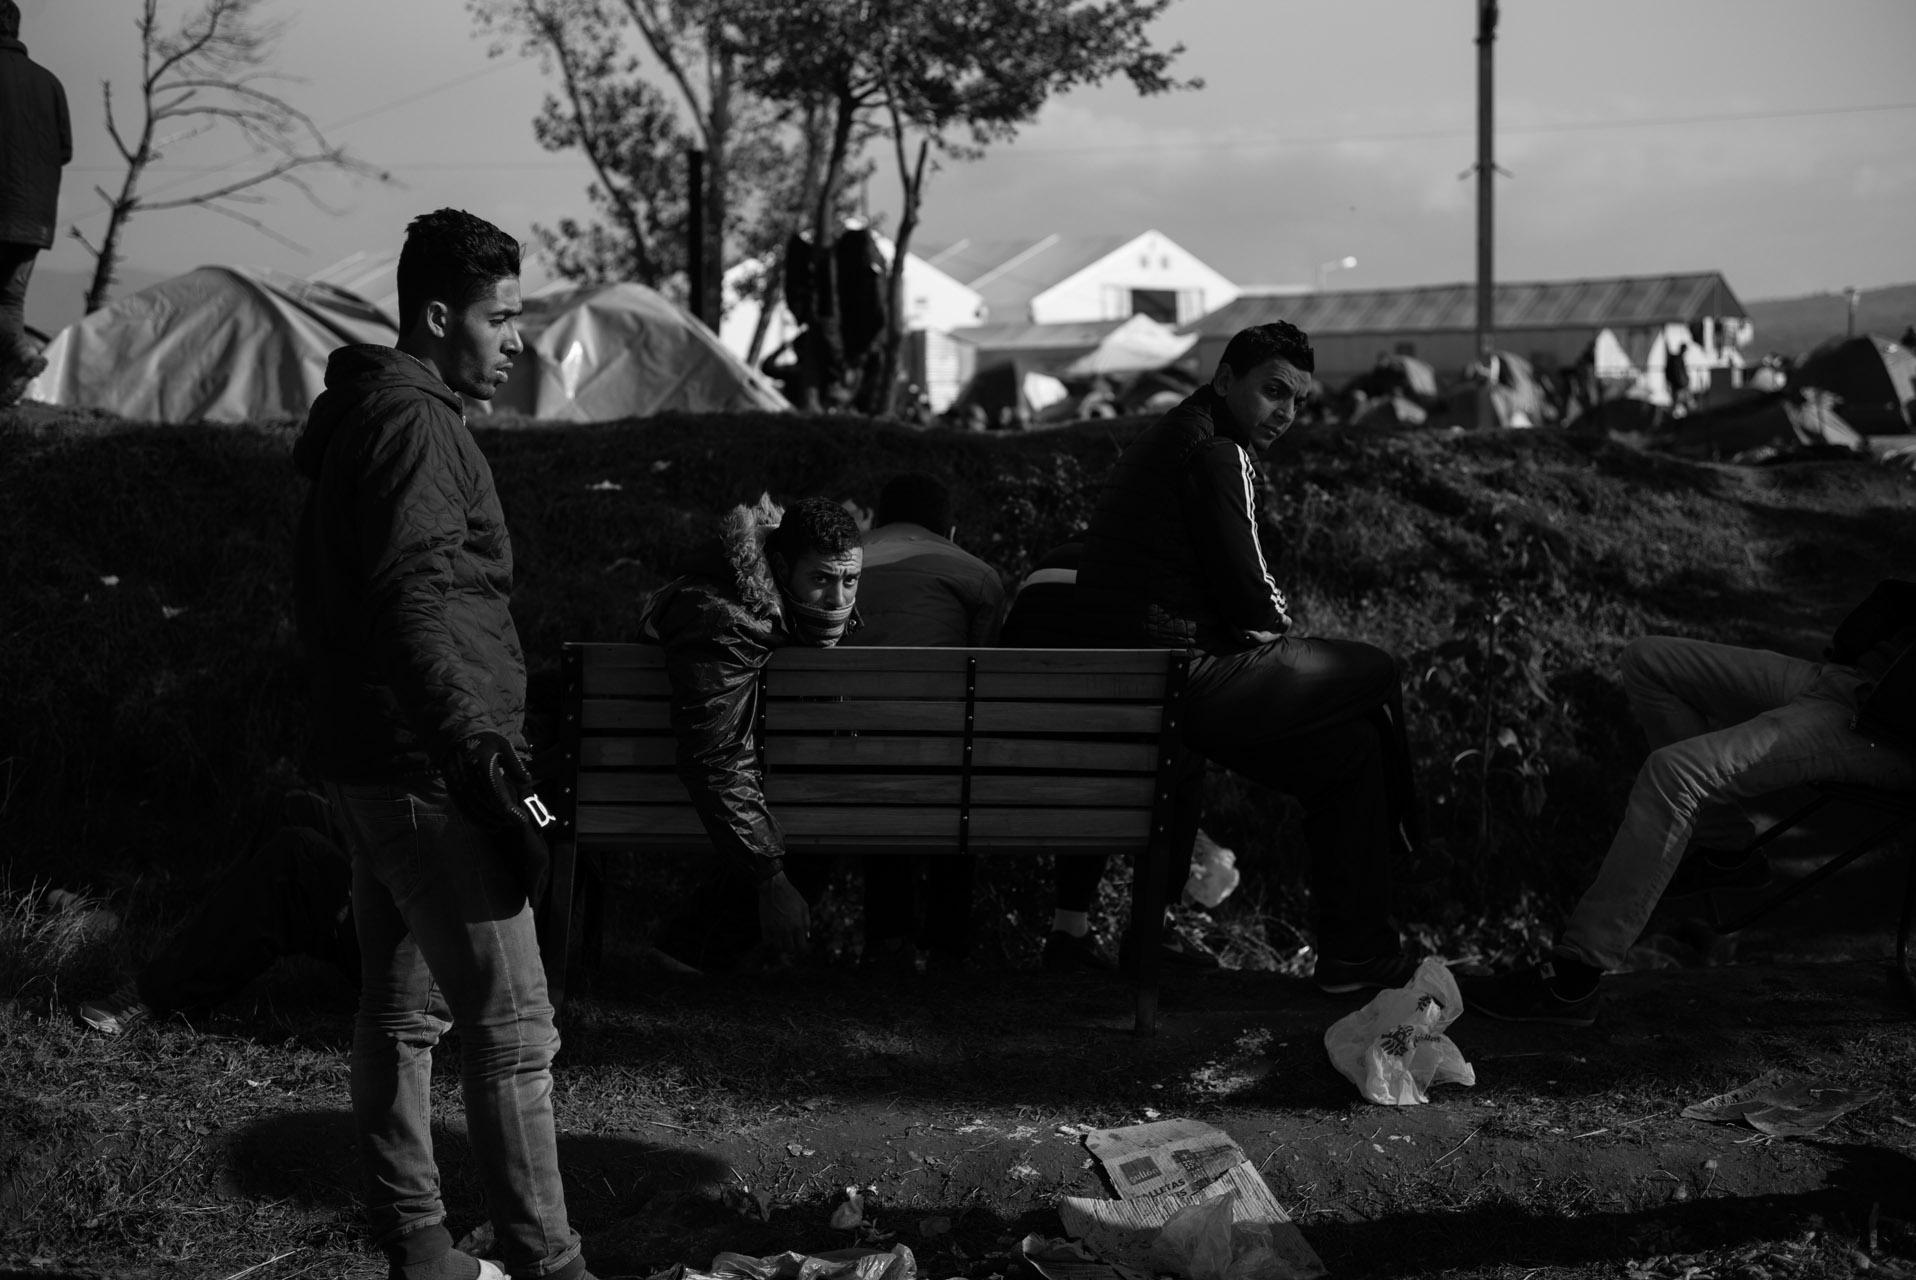 Saturday, December 5. 2015 in Idomeni, Greece.